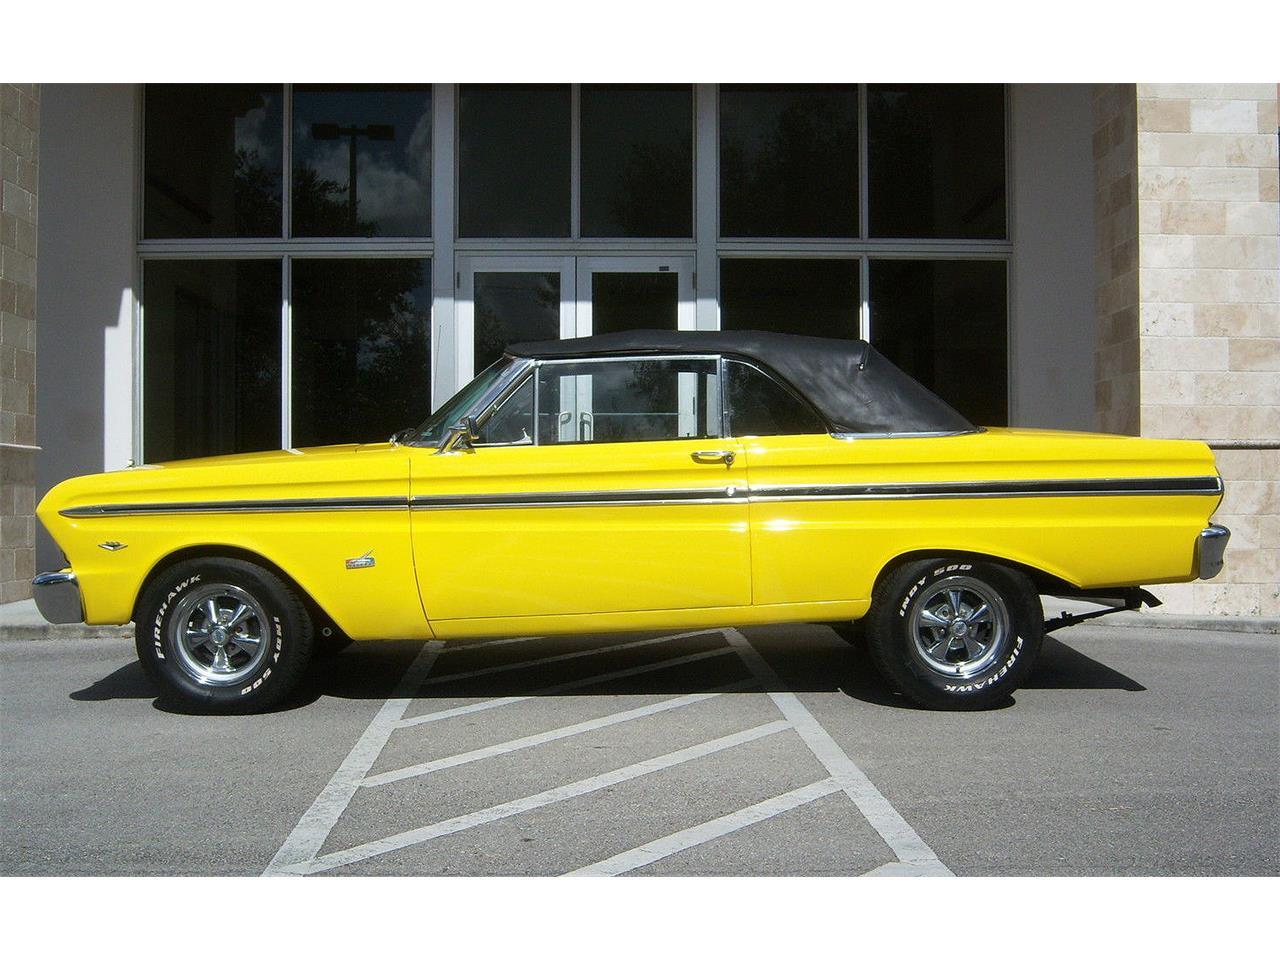 Large Picture of Classic 1965 Falcon Futura located in New Jersey - $20,000.00 - QEVQ